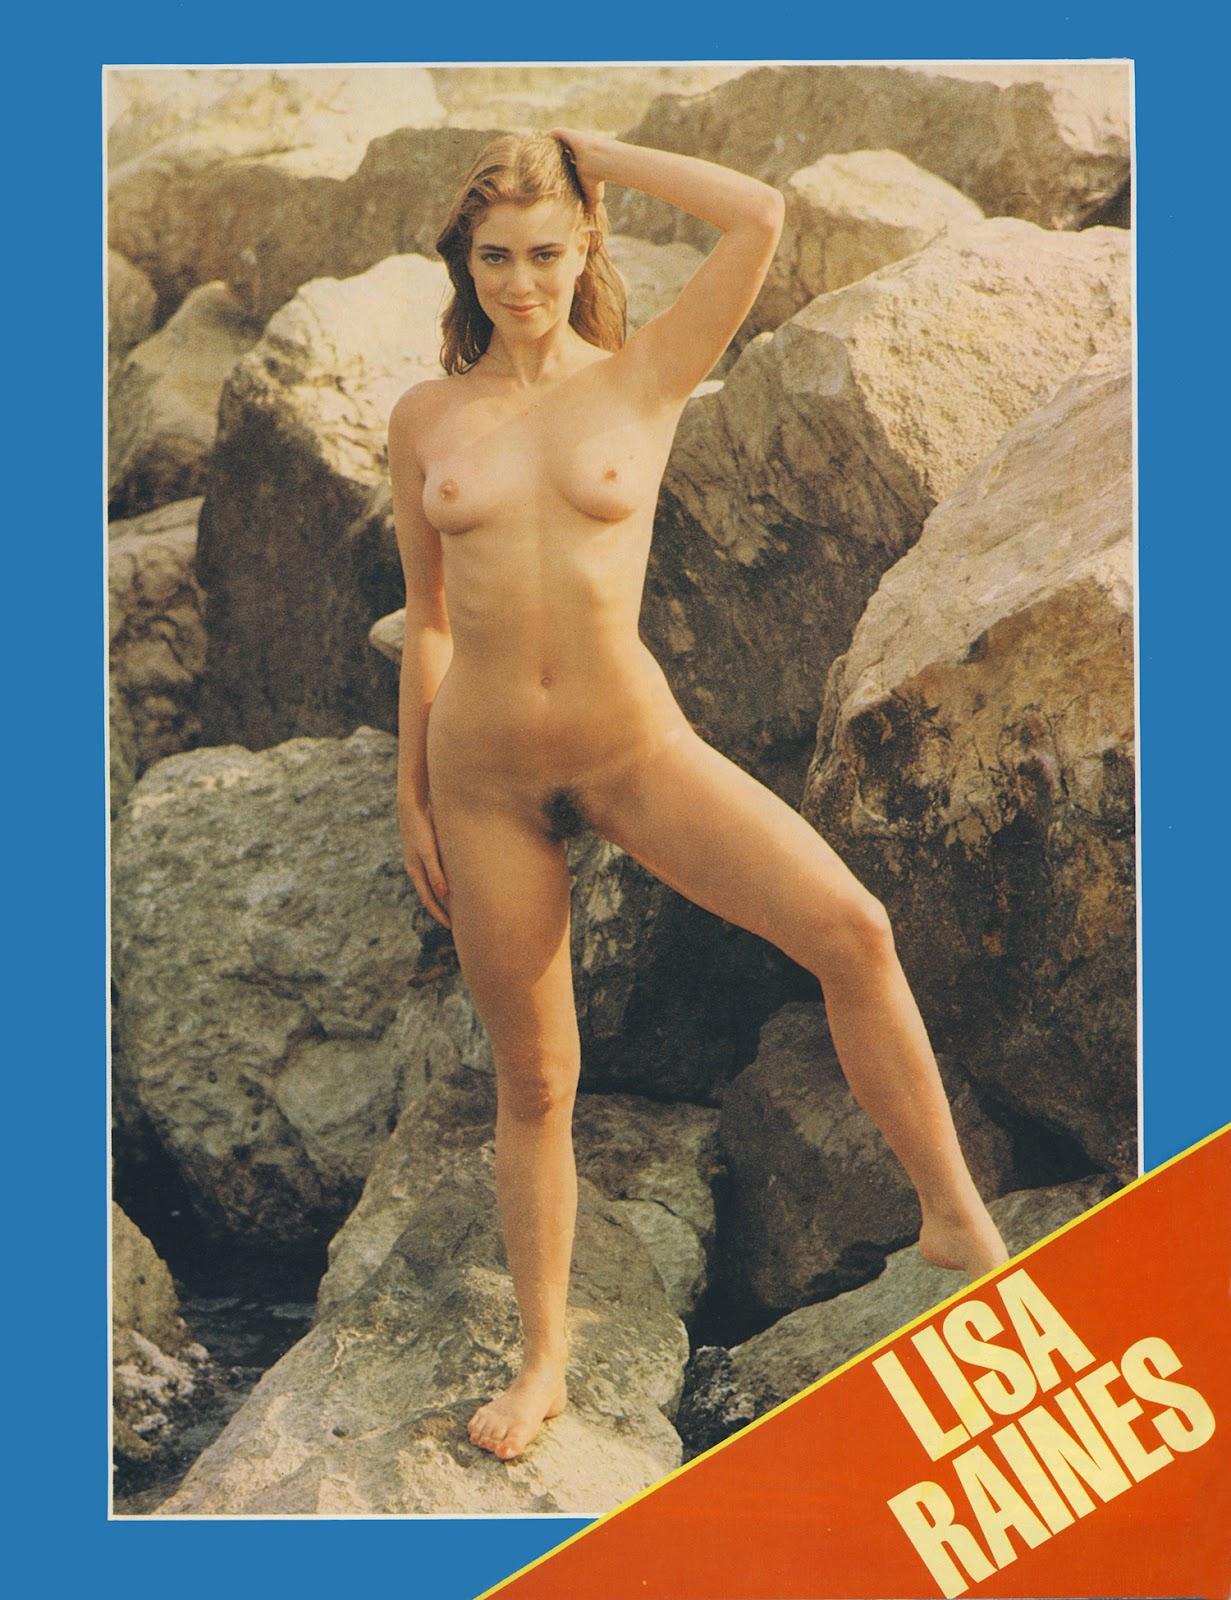 Lisa foster fanny hill nude